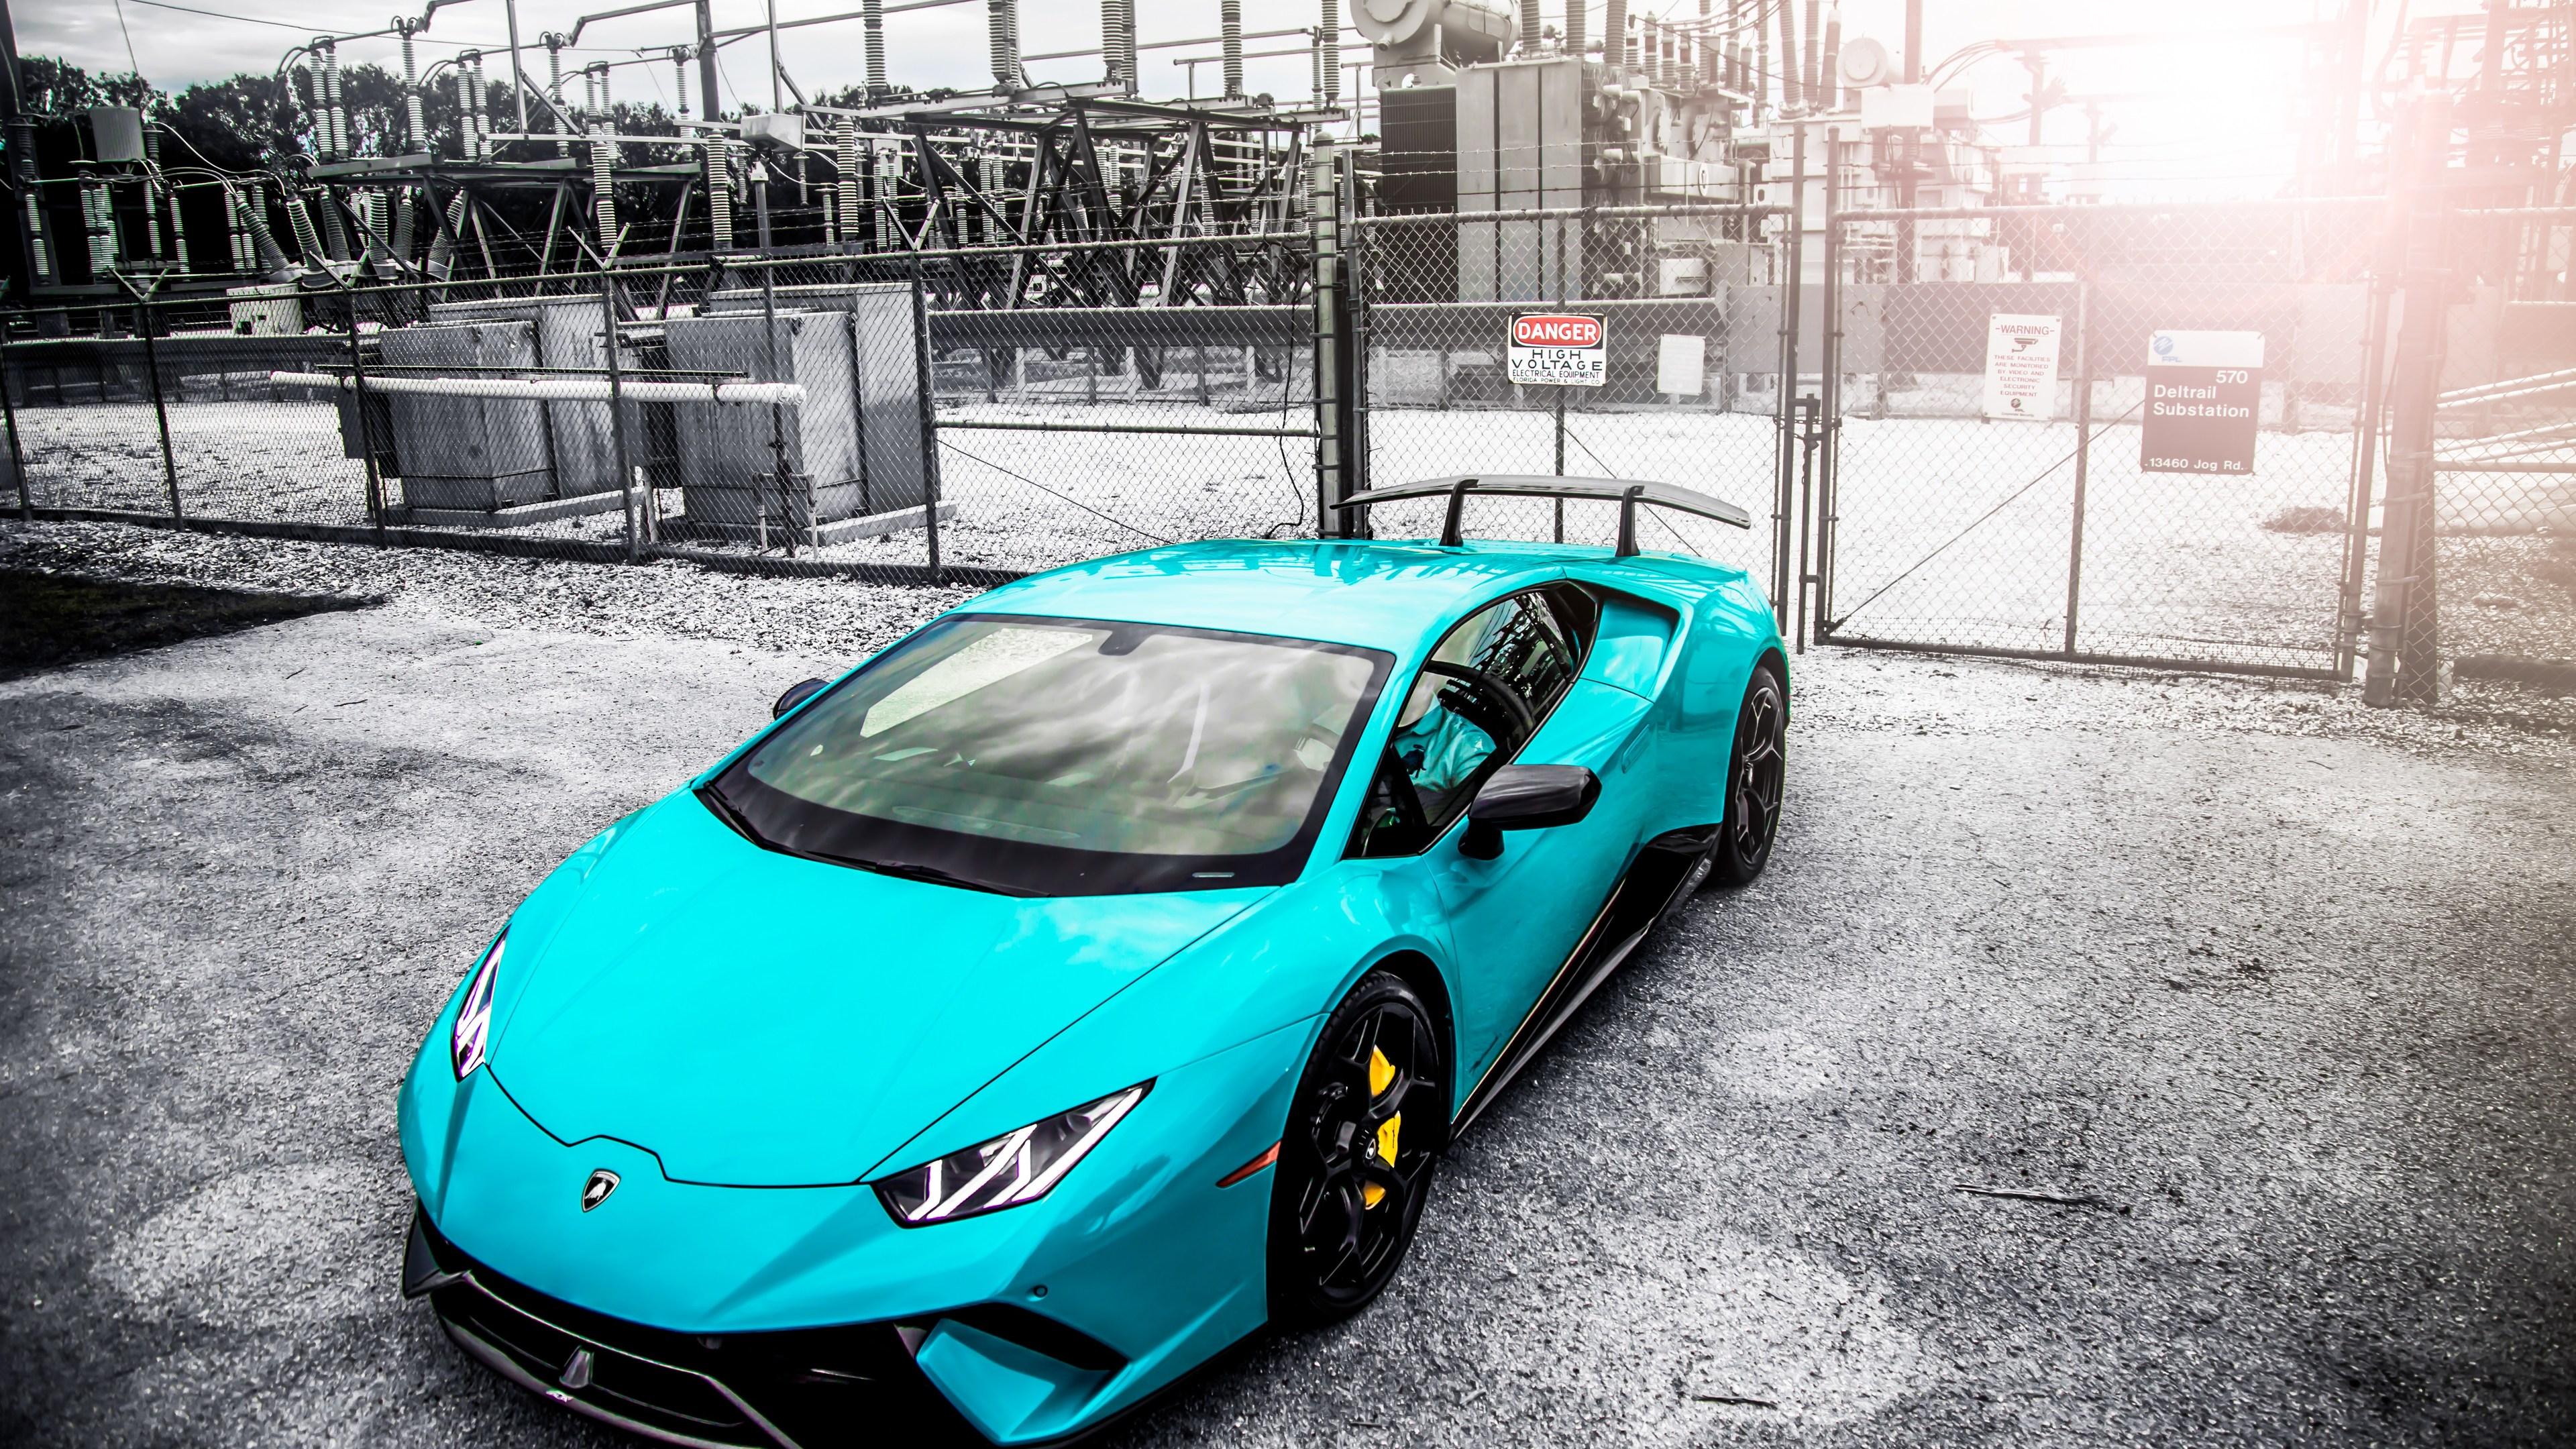 lamborghini huracan lp610 4 1539792797 - Lamborghini Huracan LP610 4 - lamborghini wallpapers, lamborghini huracan wallpapers, hd-wallpapers, cars wallpapers, 5k wallpapers, 4k-wallpapers